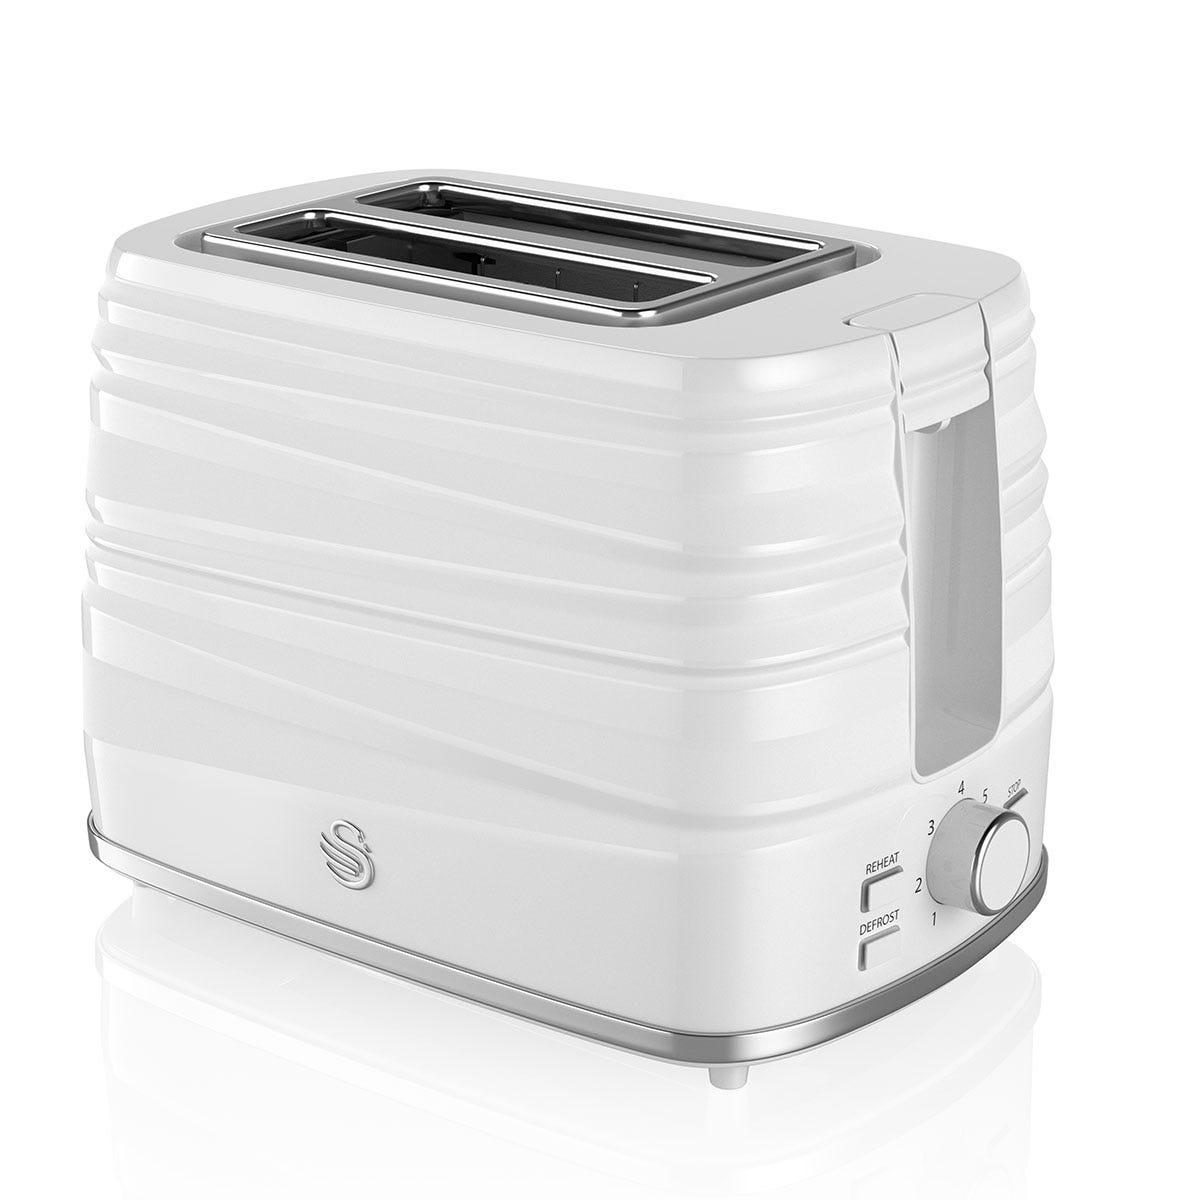 Swan ST31050WN Symphony 2 Slice Toaster - White